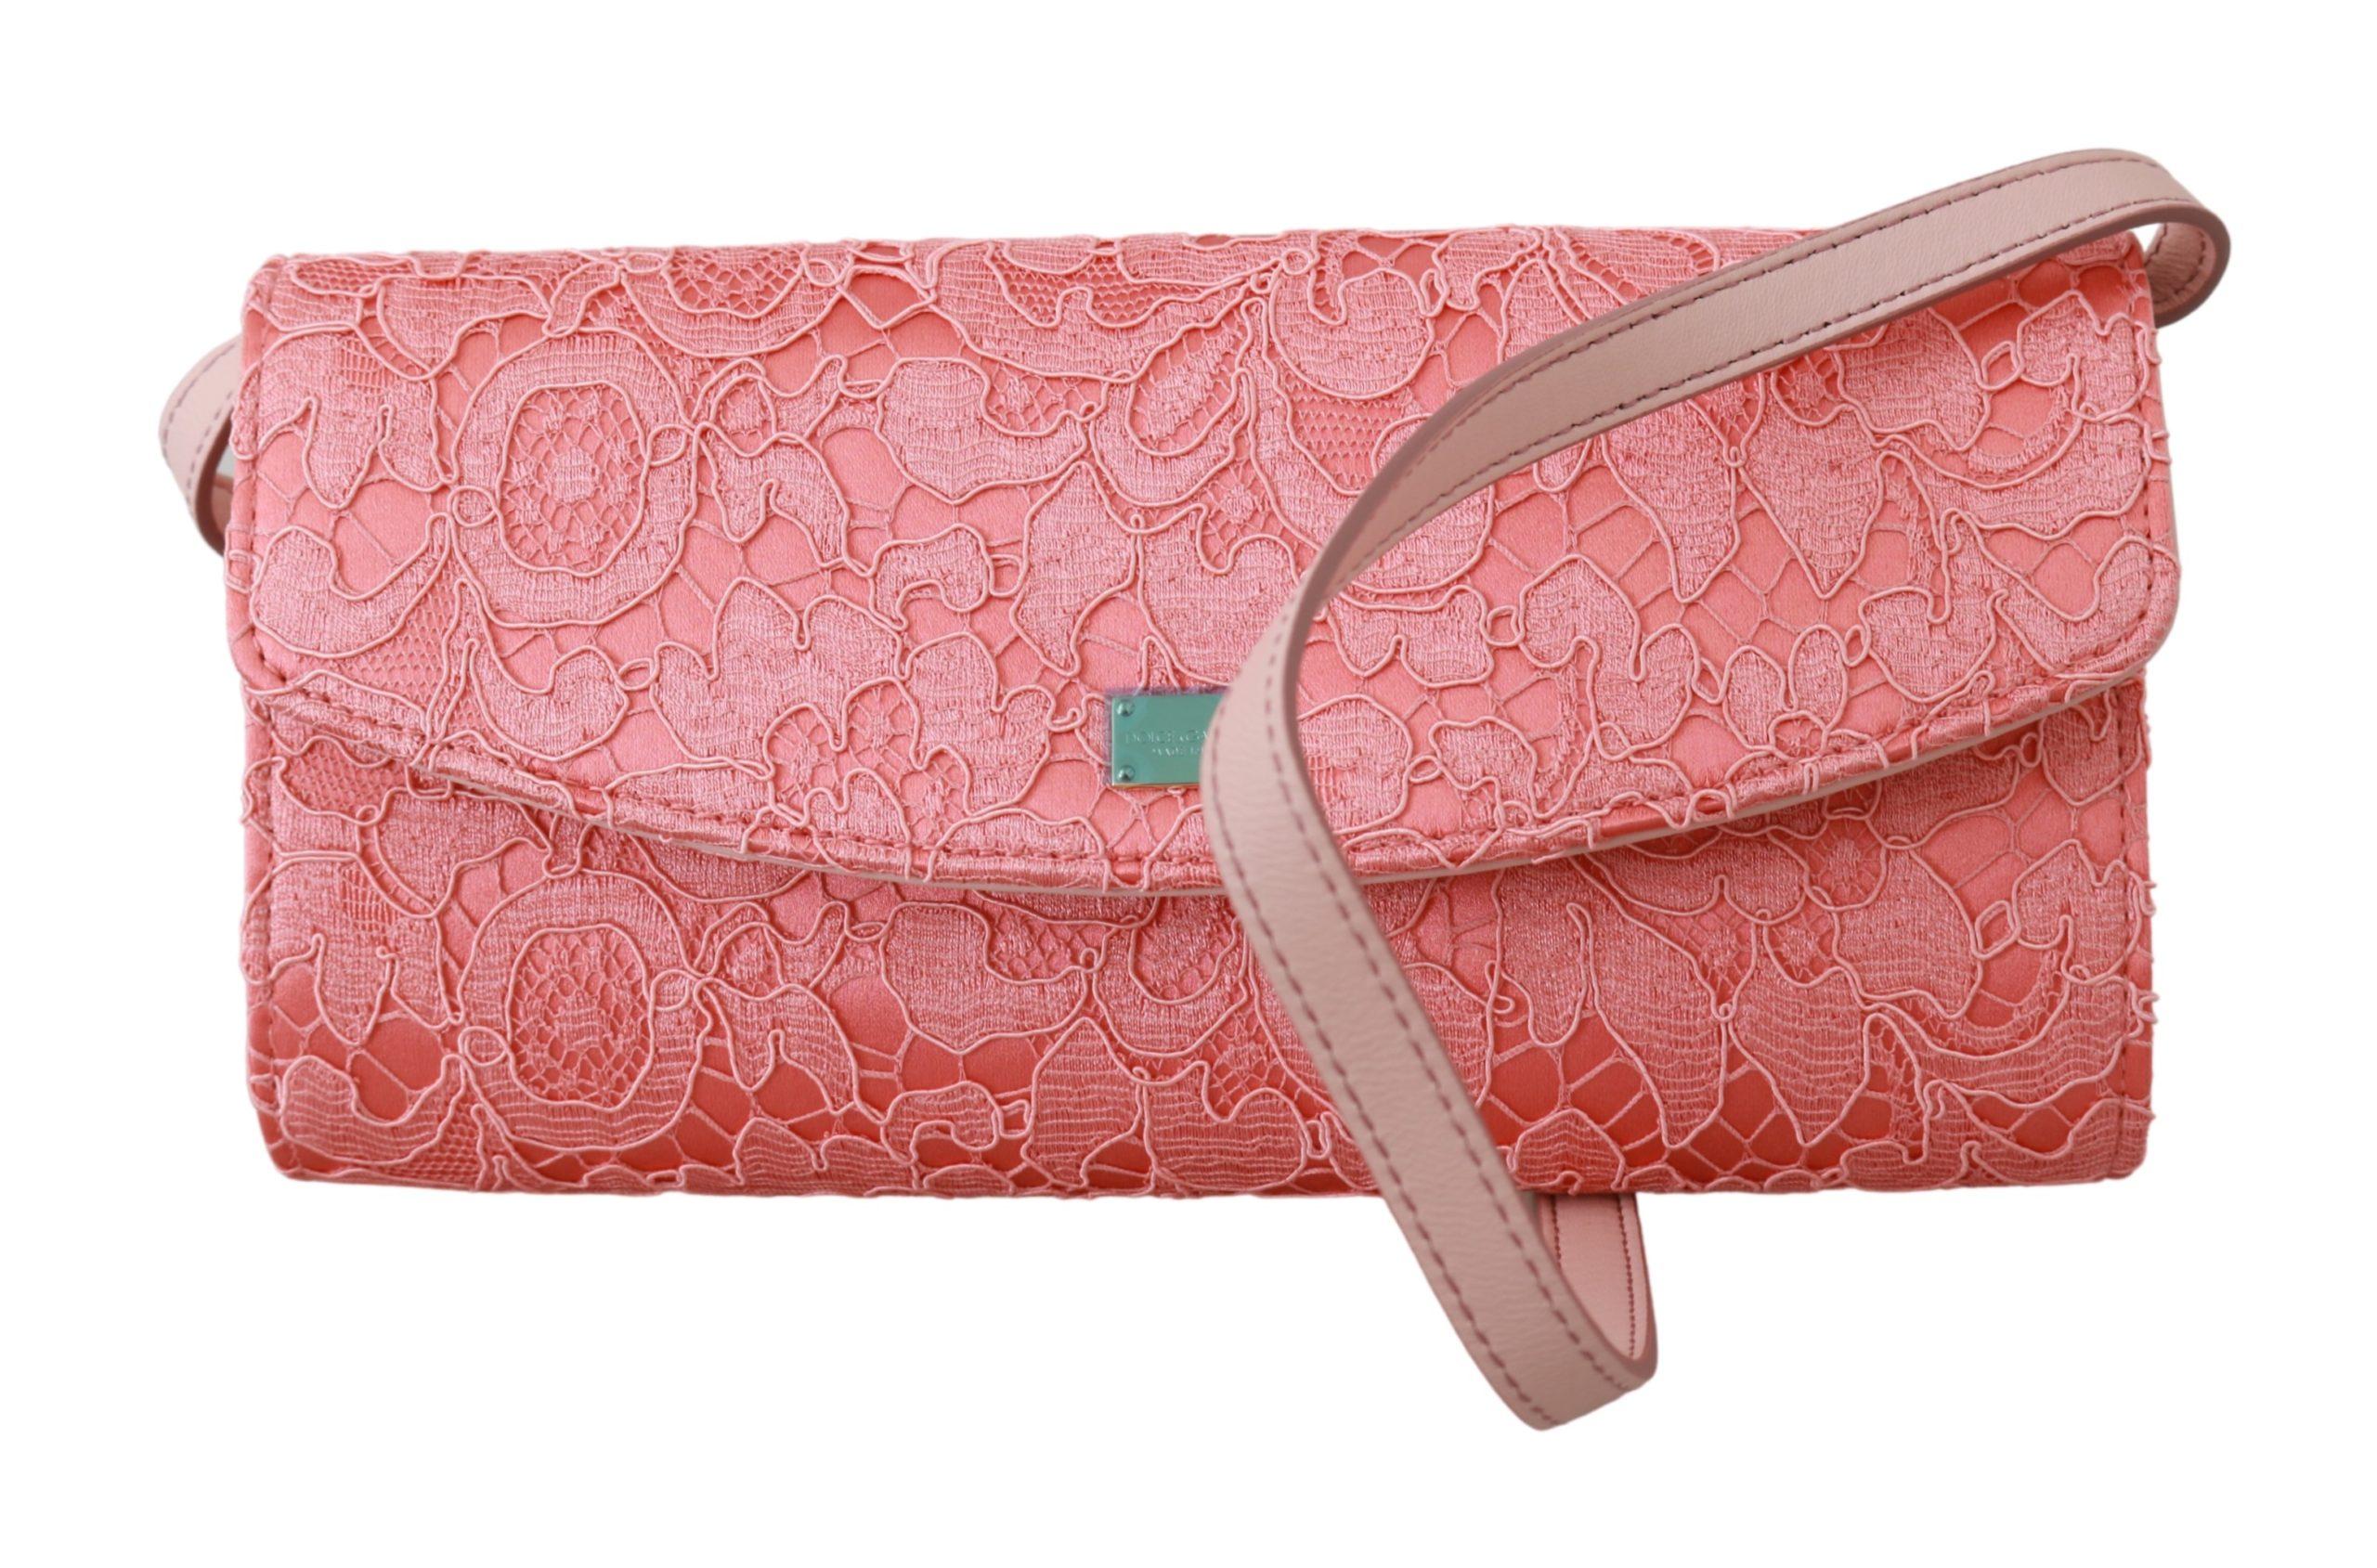 Dolce & Gabbana Women's Floral Lace Evening Long Cotton Crossbody Bag Pink VAS9204